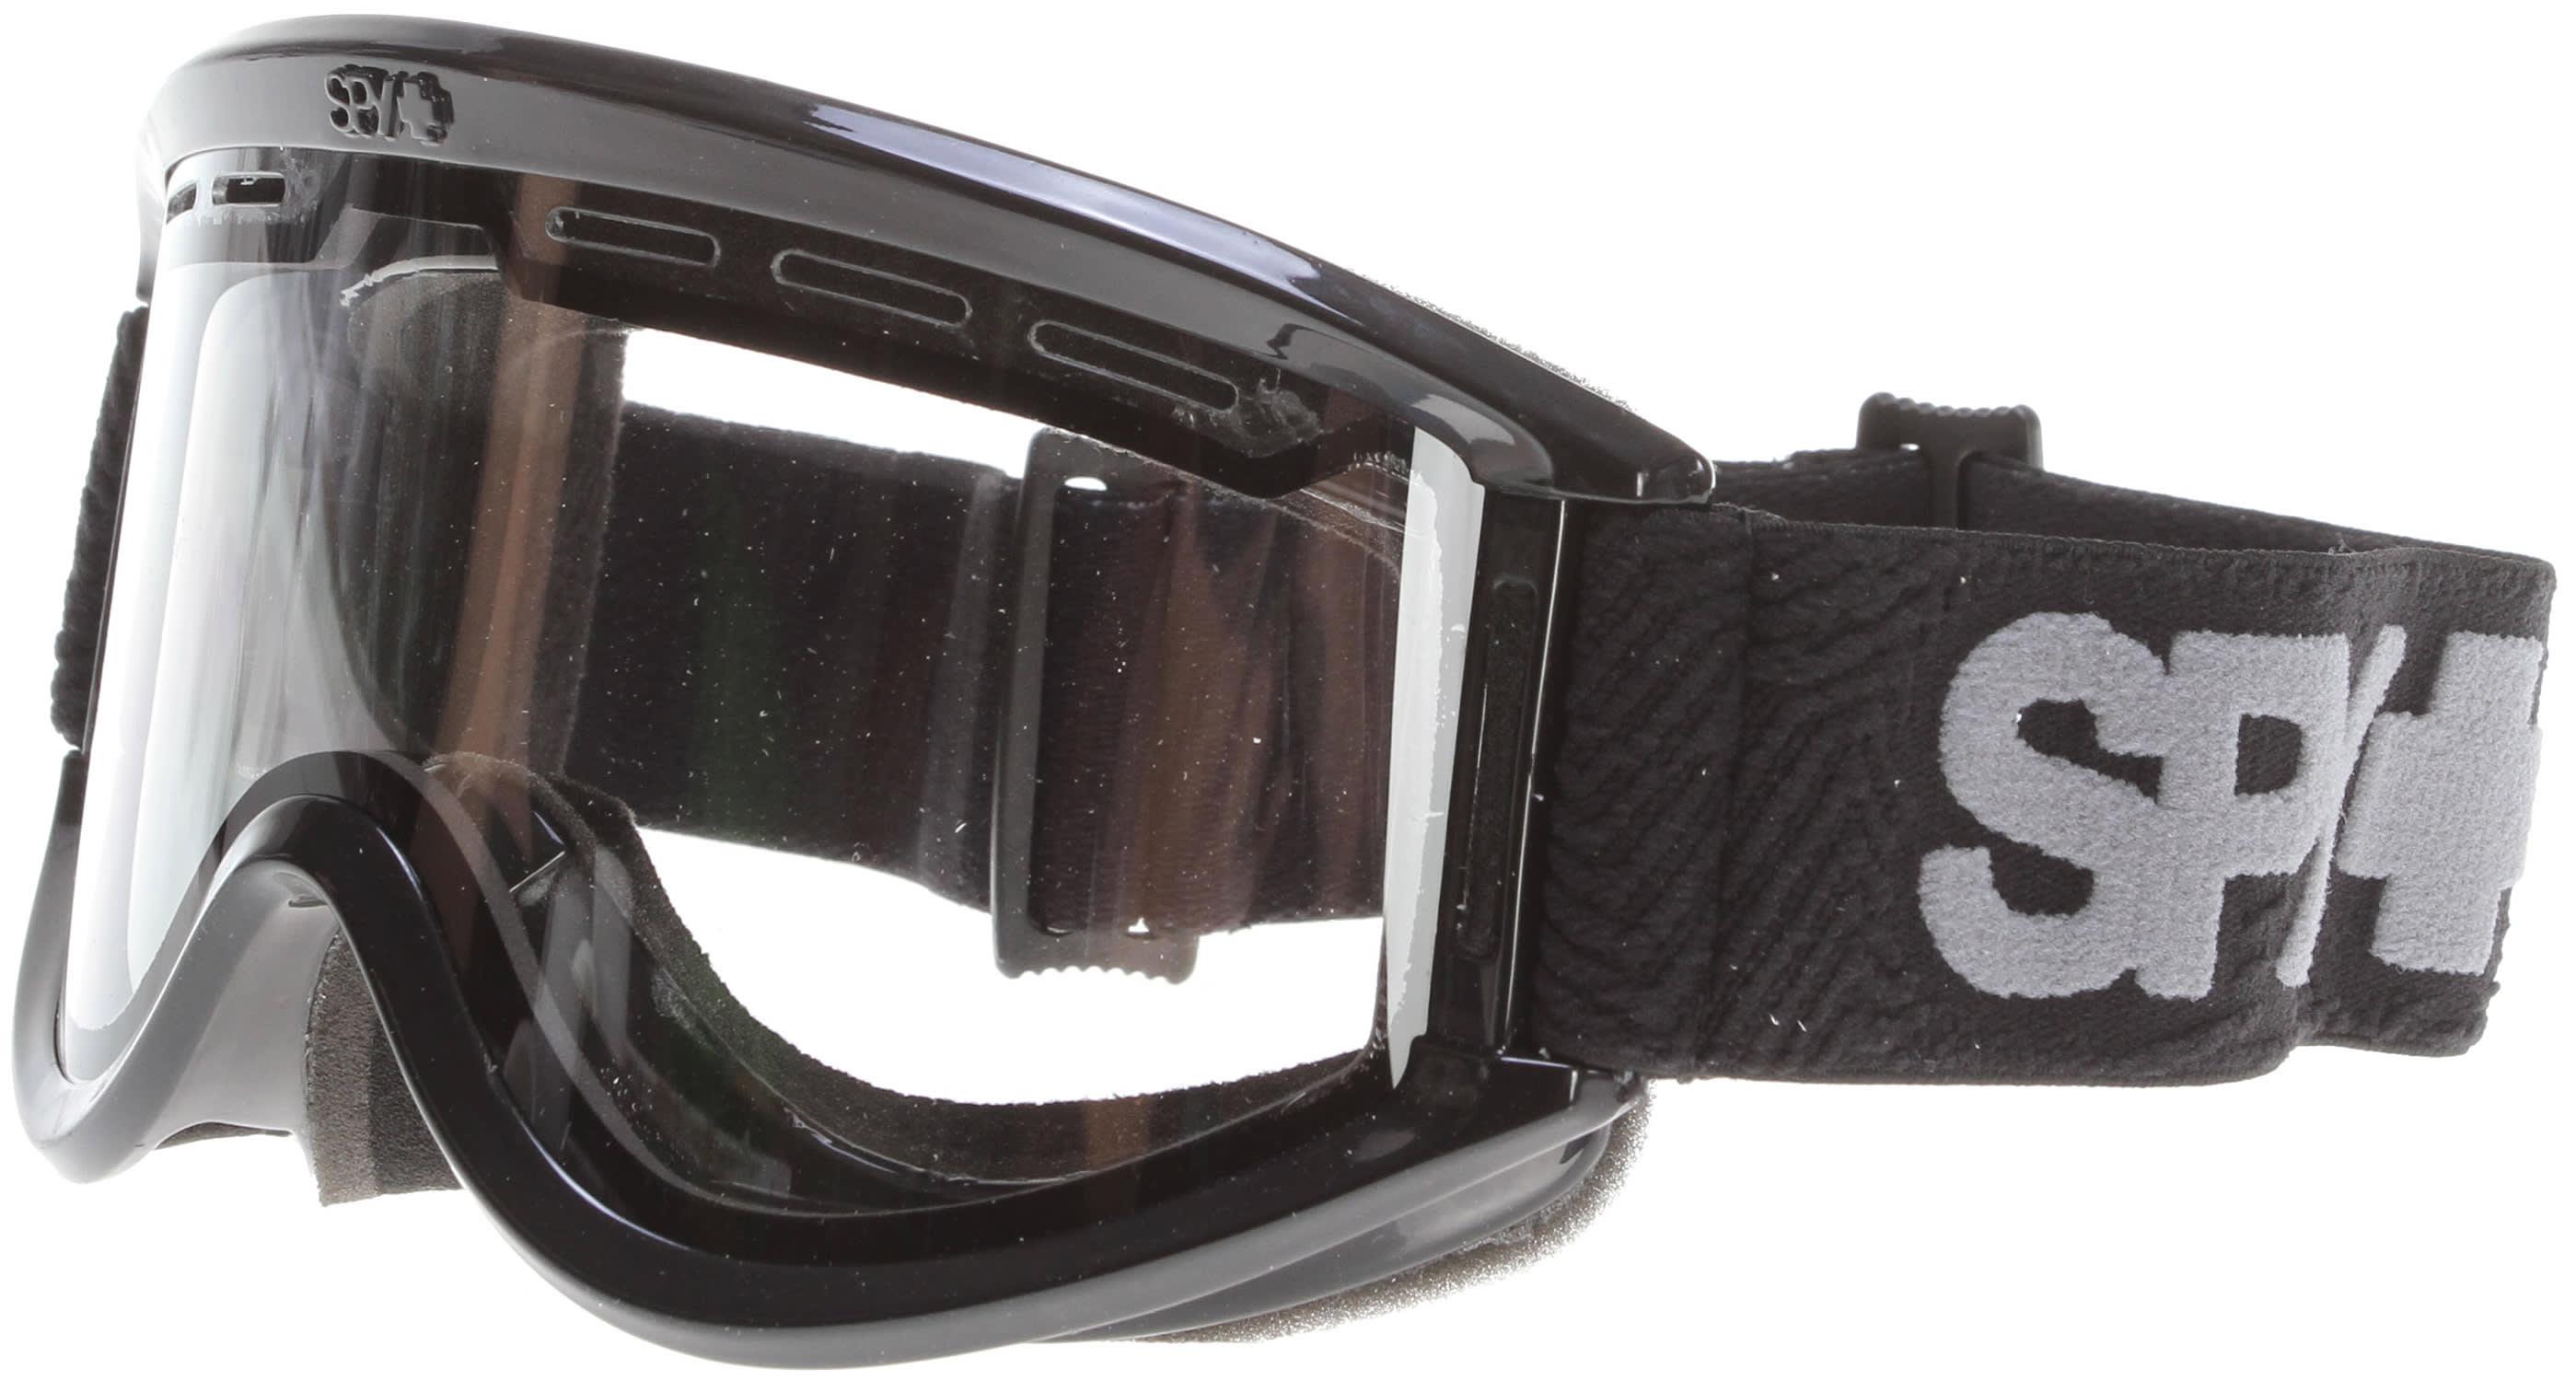 9538771b615 Spy Getaway Goggles - thumbnail 1